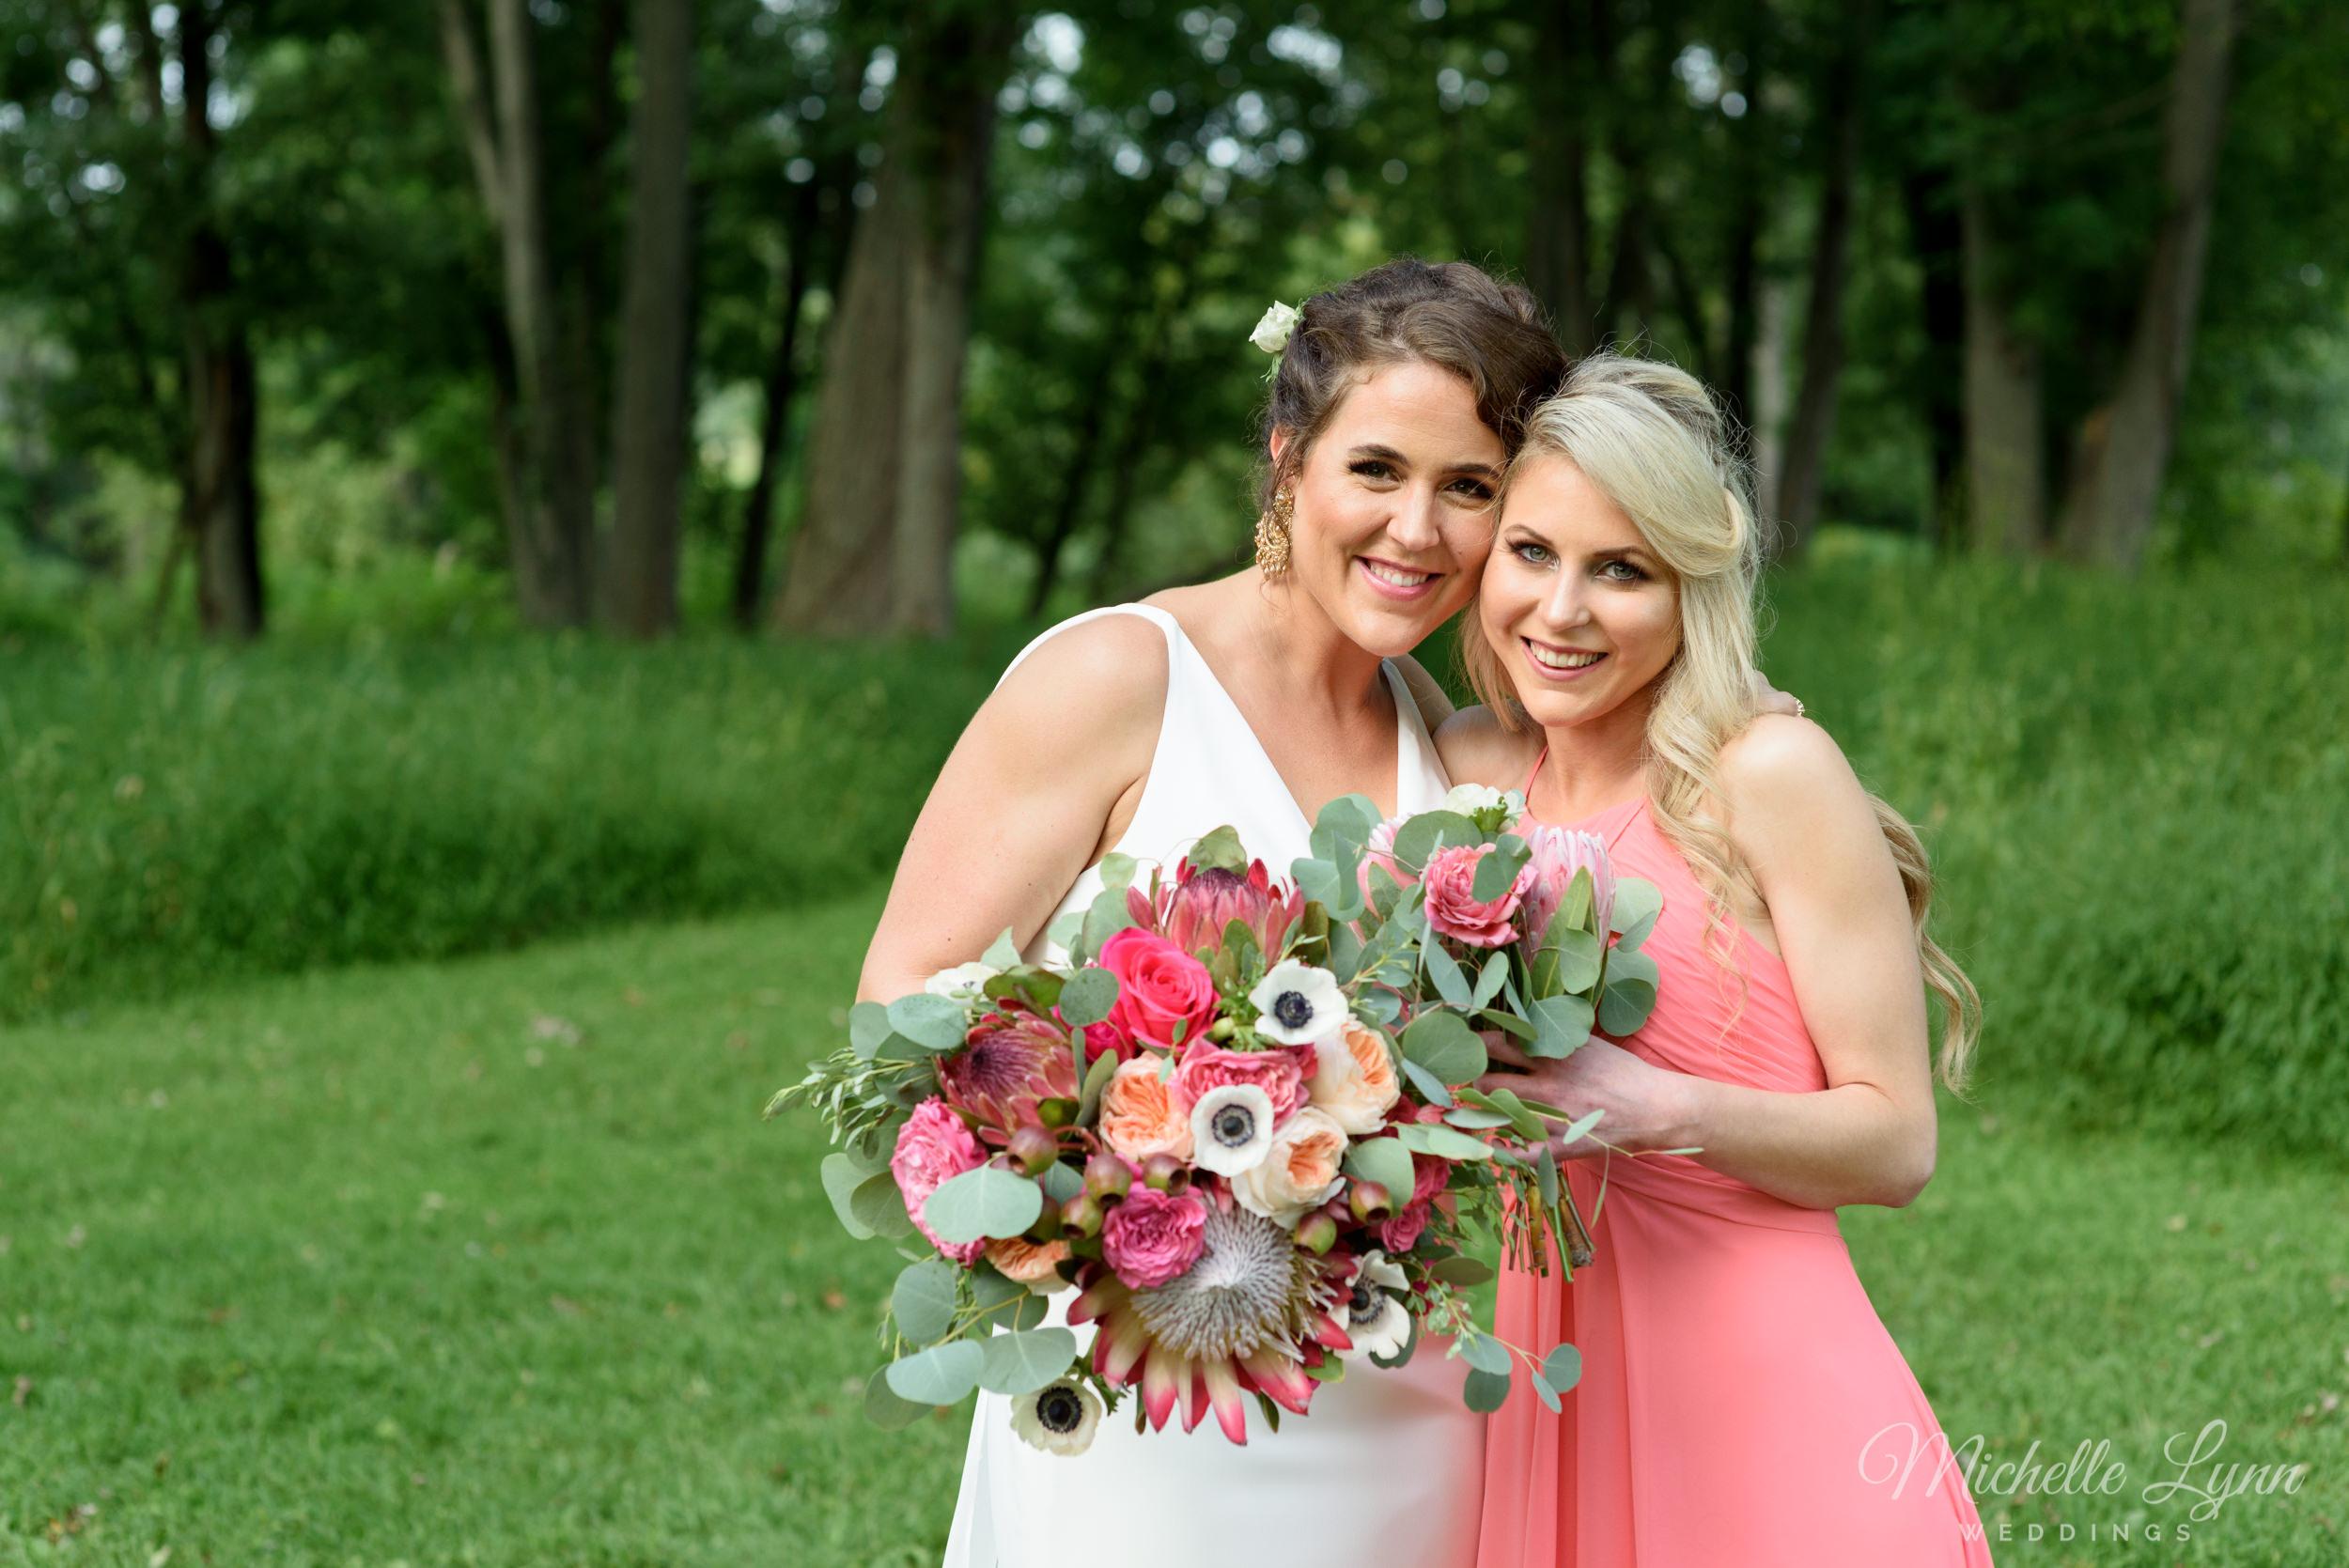 mlw-unionville-vineyards-nj-wedding-photography-54.jpg